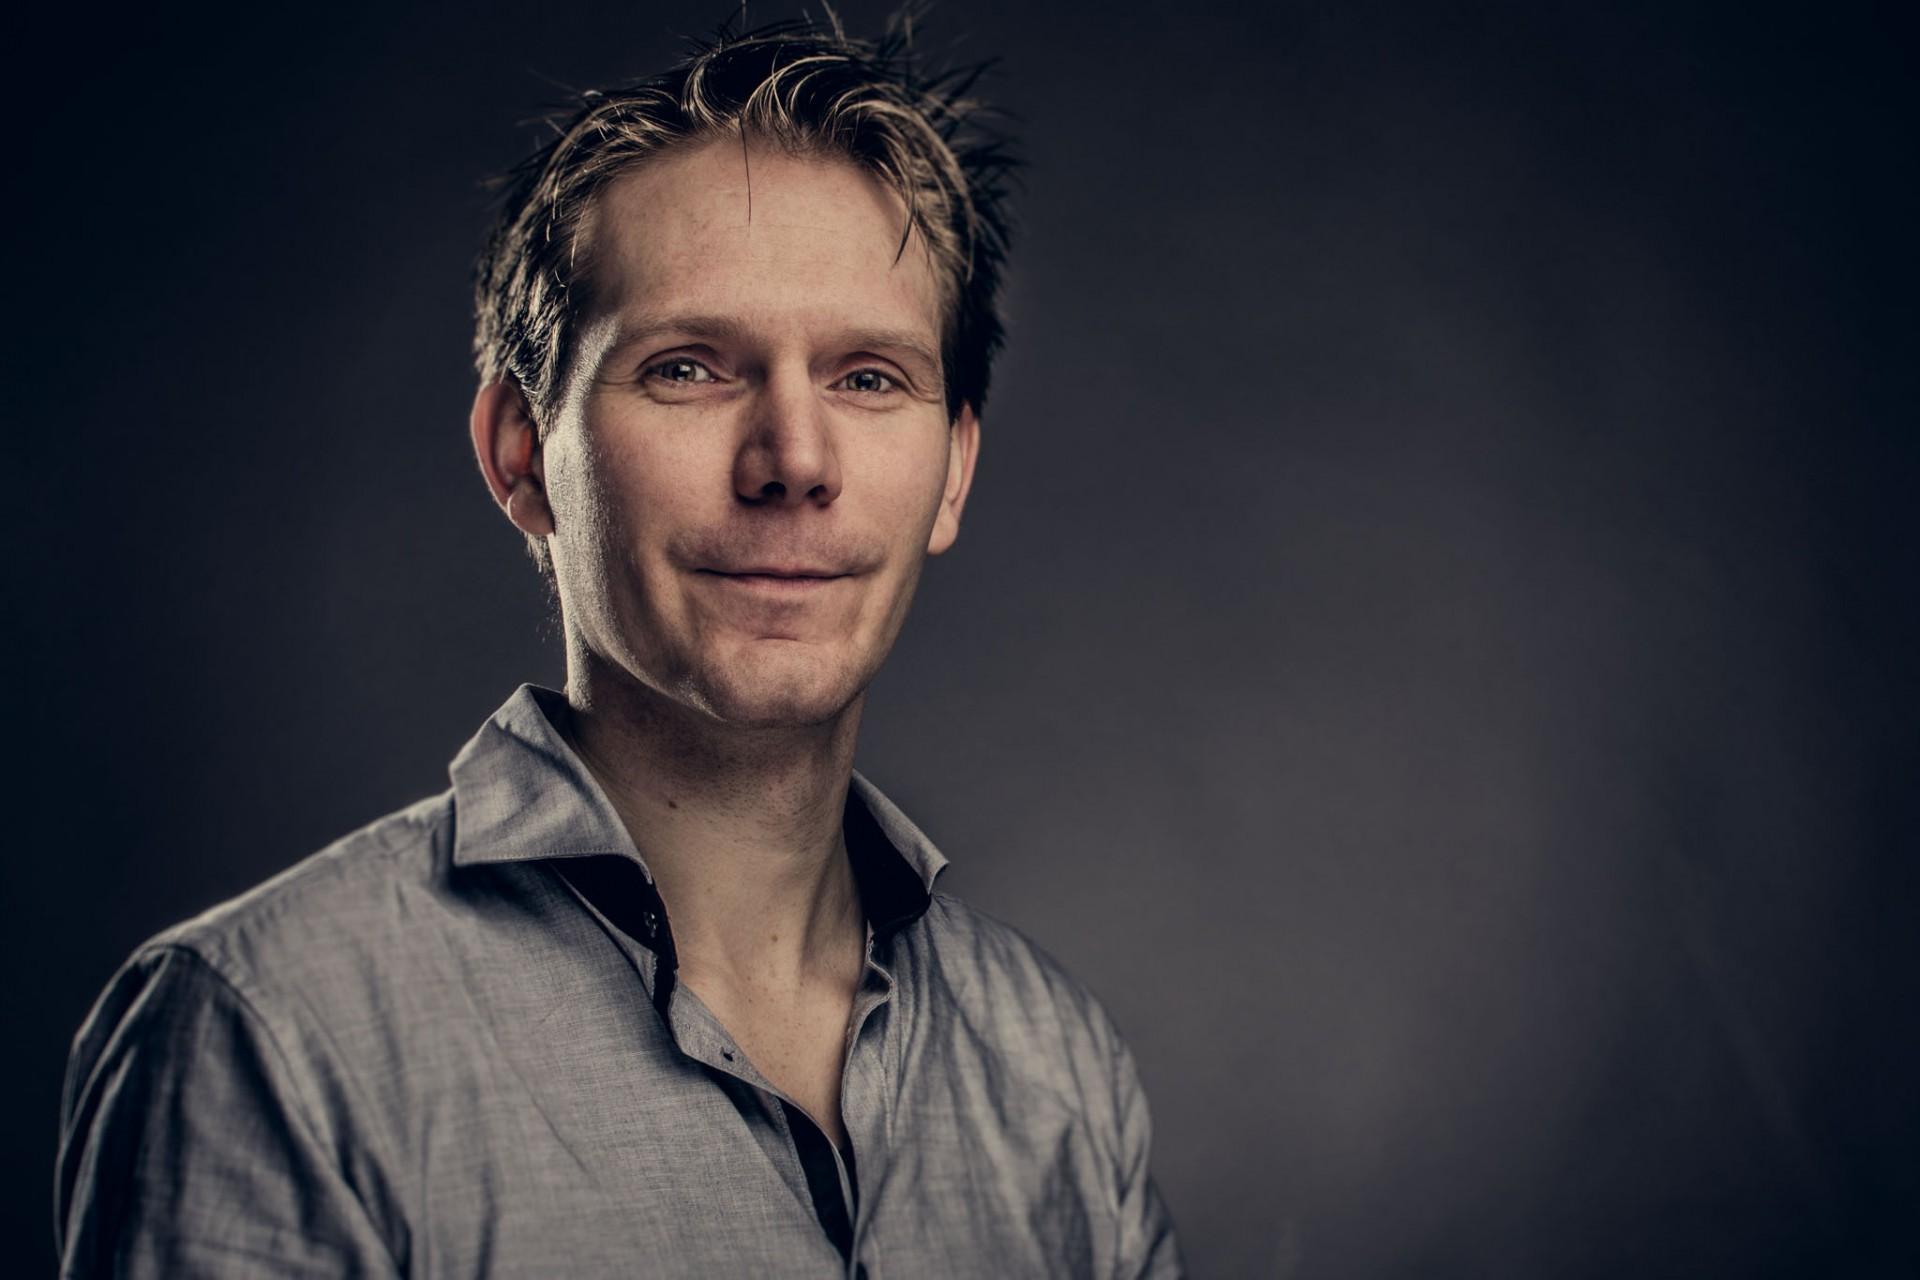 Wiliam Dijkman